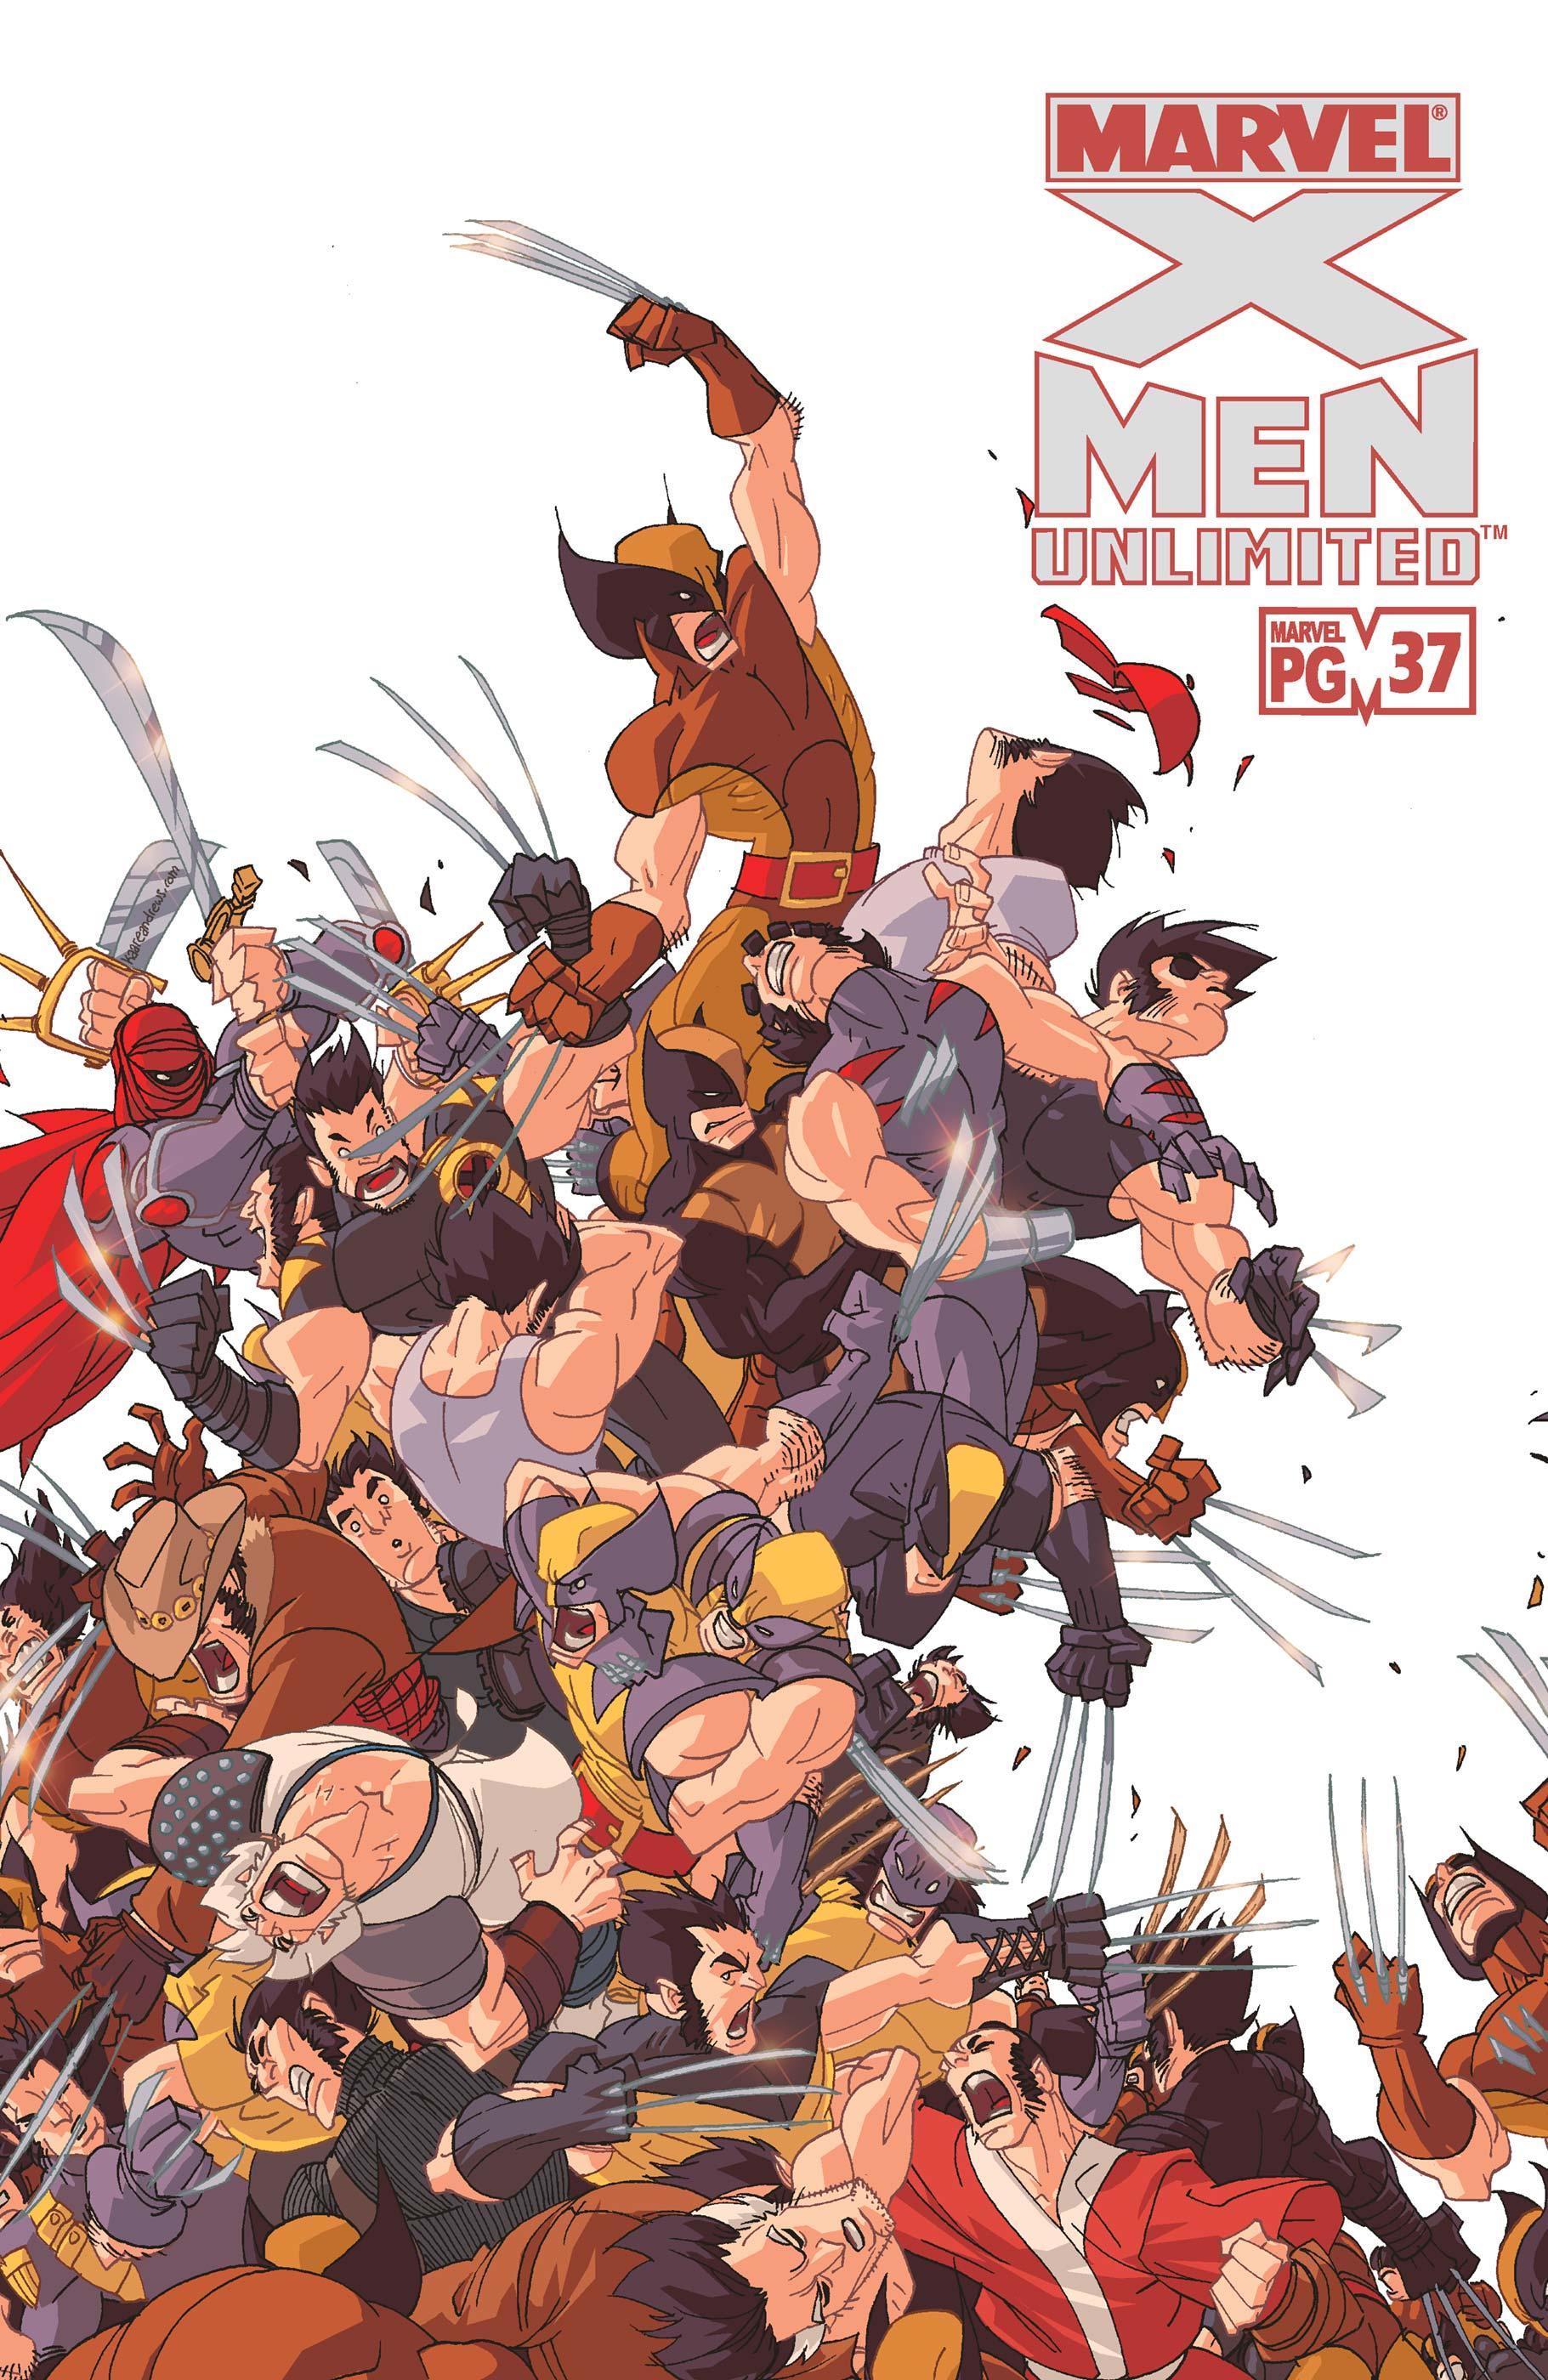 X-Men Unlimited (1993) #37